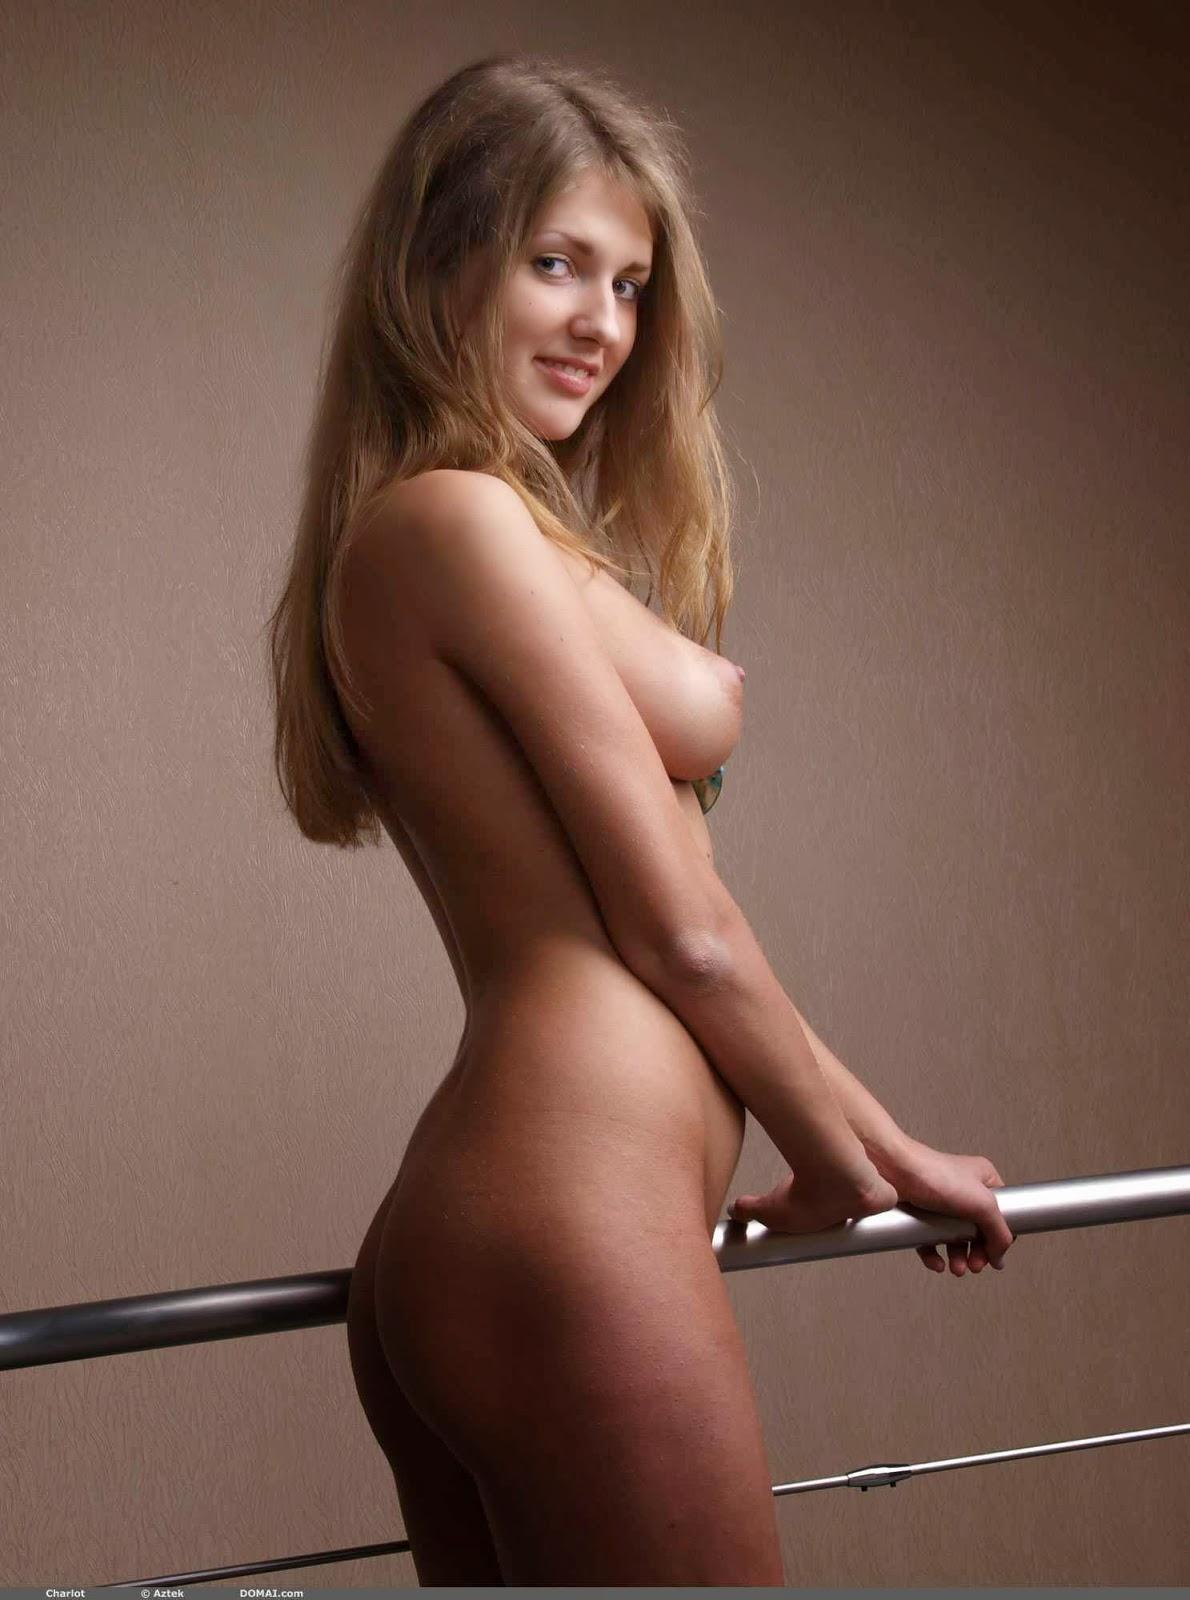 Charlot lepotica seks dekle soba slike-5413